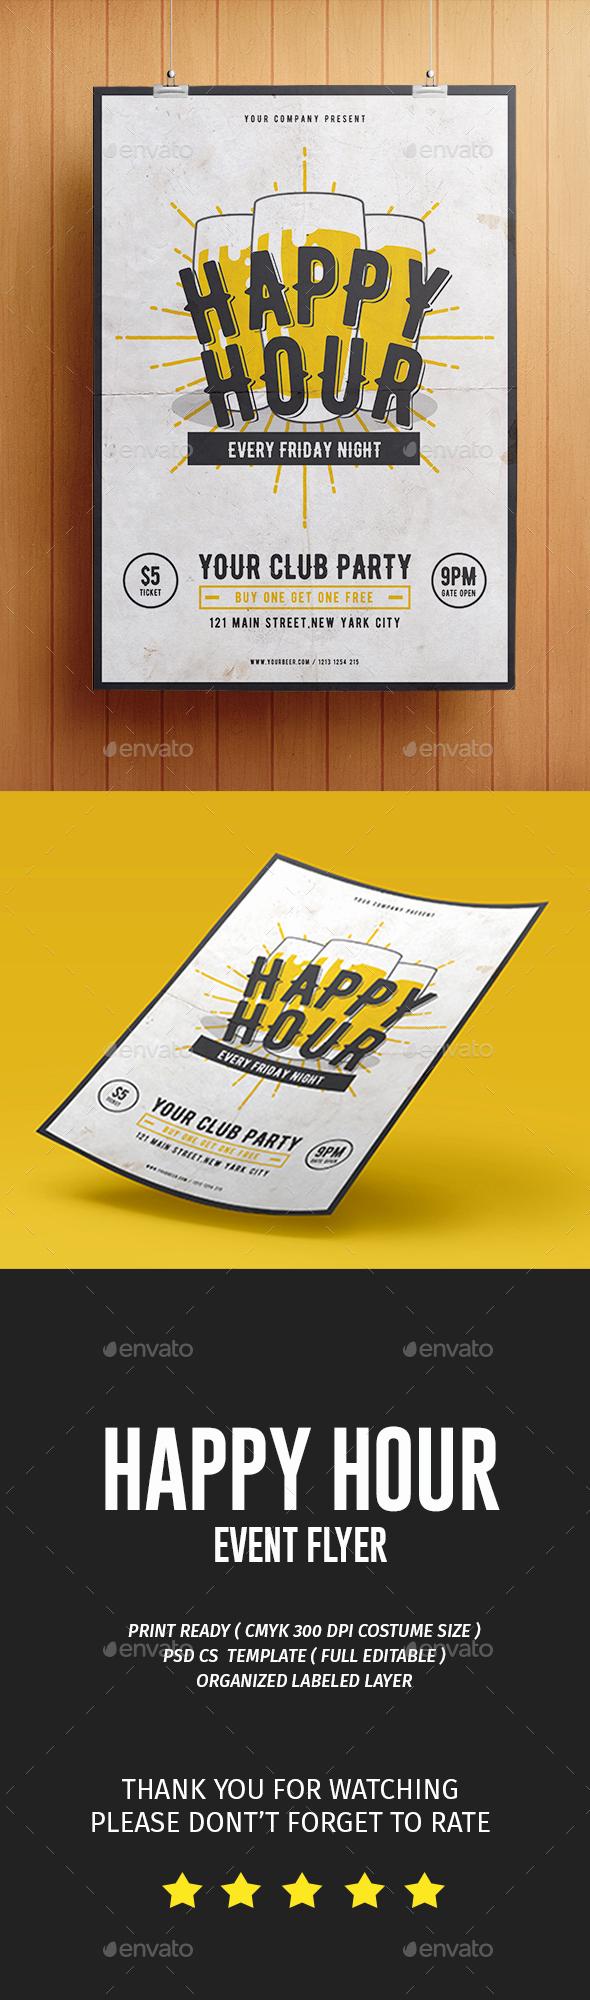 Happy Hour Menu Template Inspirational Happy Hour Flyer by tokosatsu